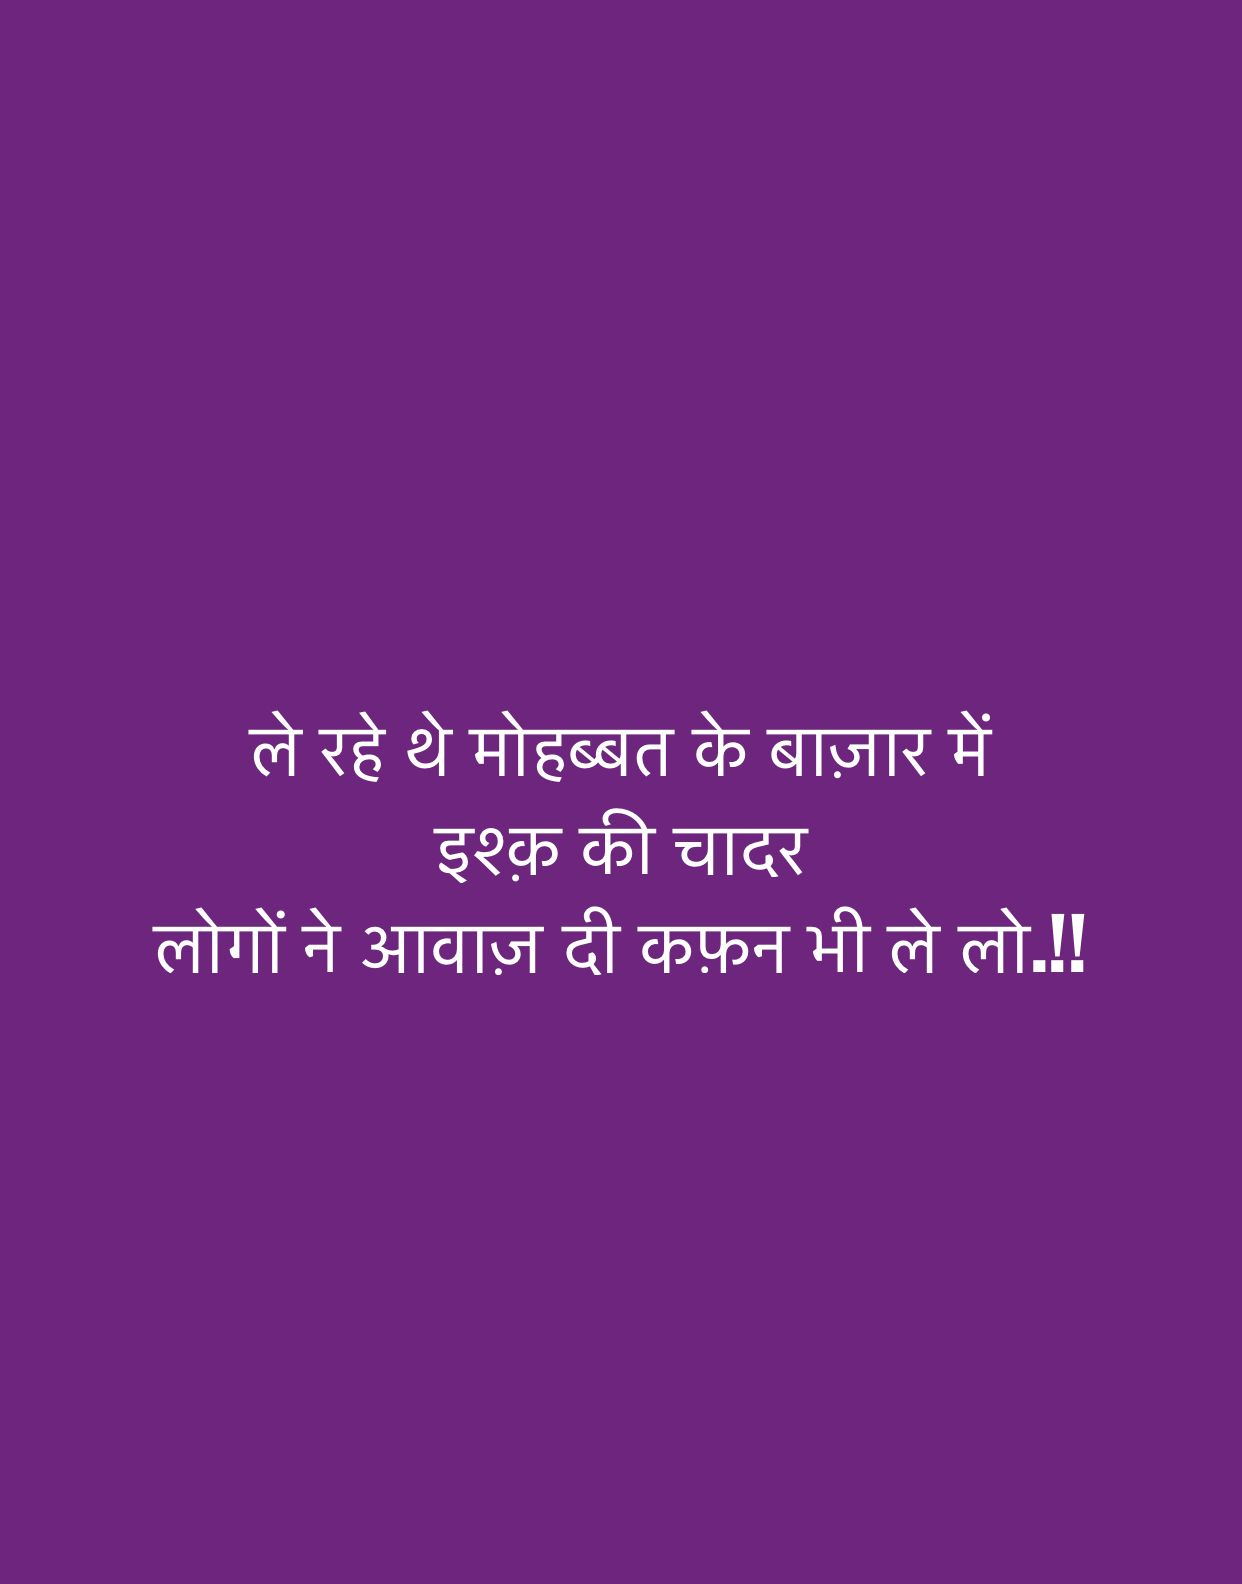 Pin by Dr. Rahul Kumar on Feelings in 2020   Hindi good ...